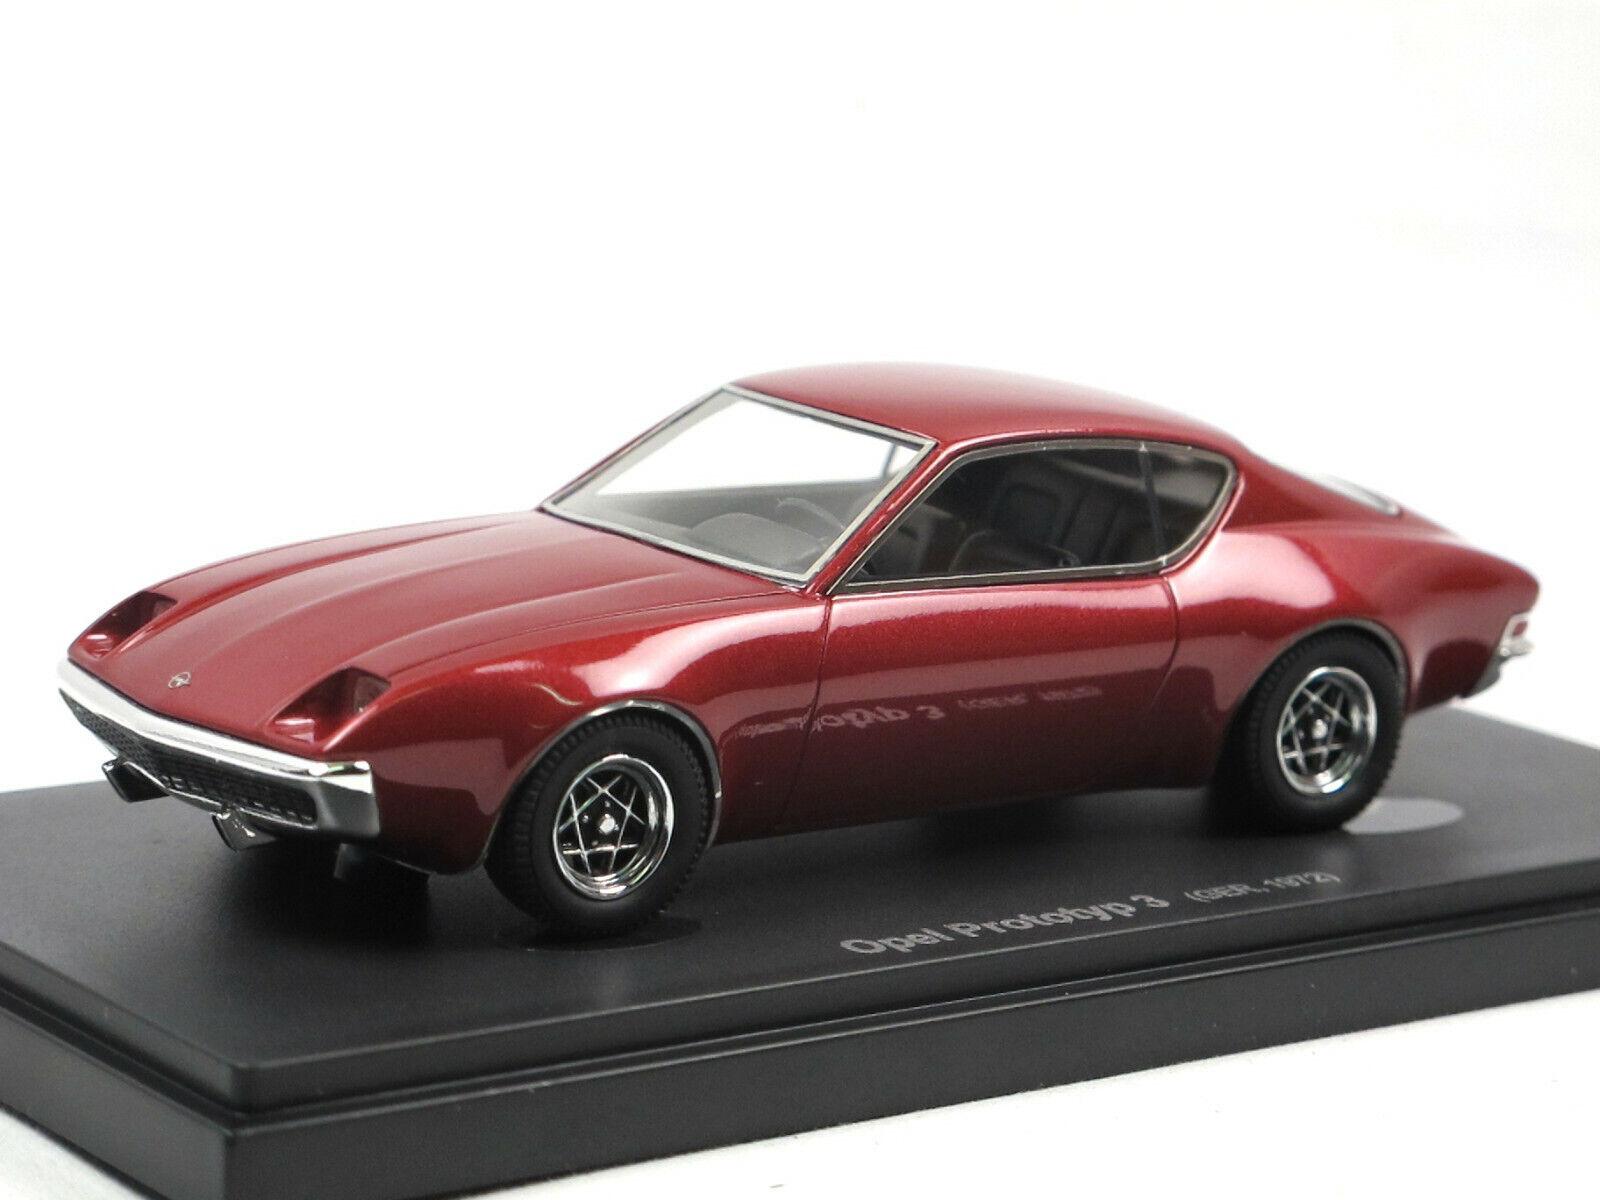 AVENUE 43 autocult 60025 OPEL Prougeotype 3-Opel Manta B étude 1972 Rouge 1 43